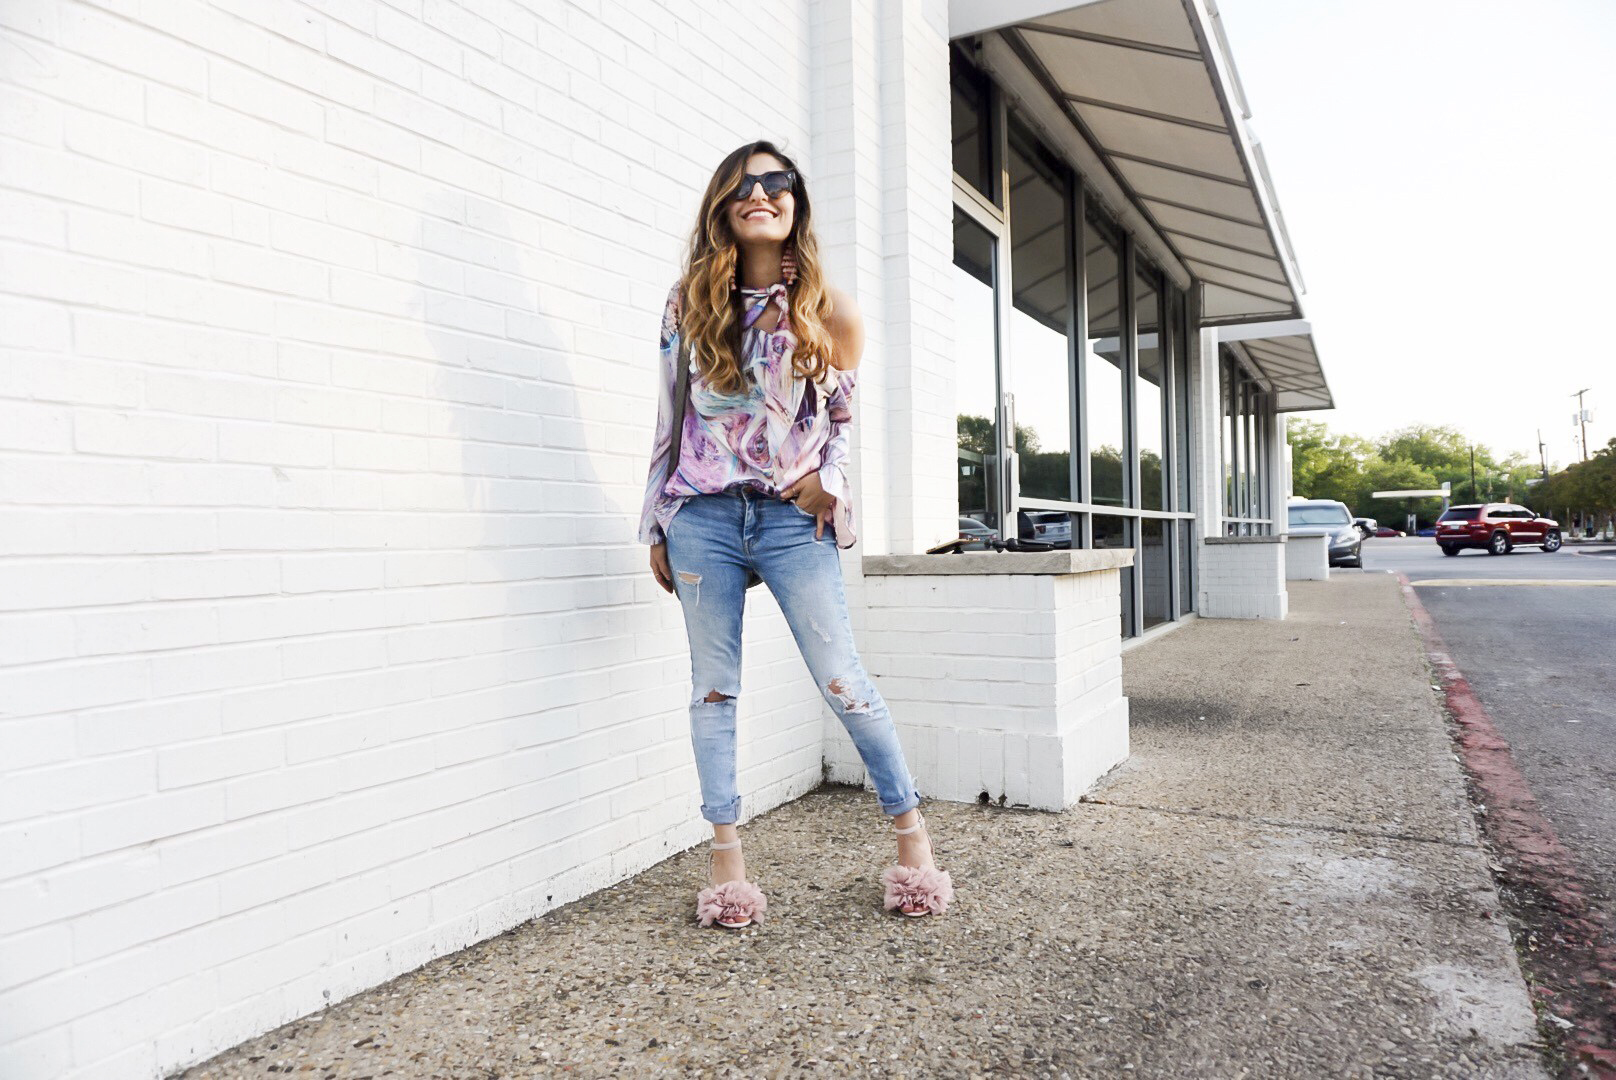 Pretty in Pink | Ruffle Heels and Tie Neck Top - DesignerLipService.com